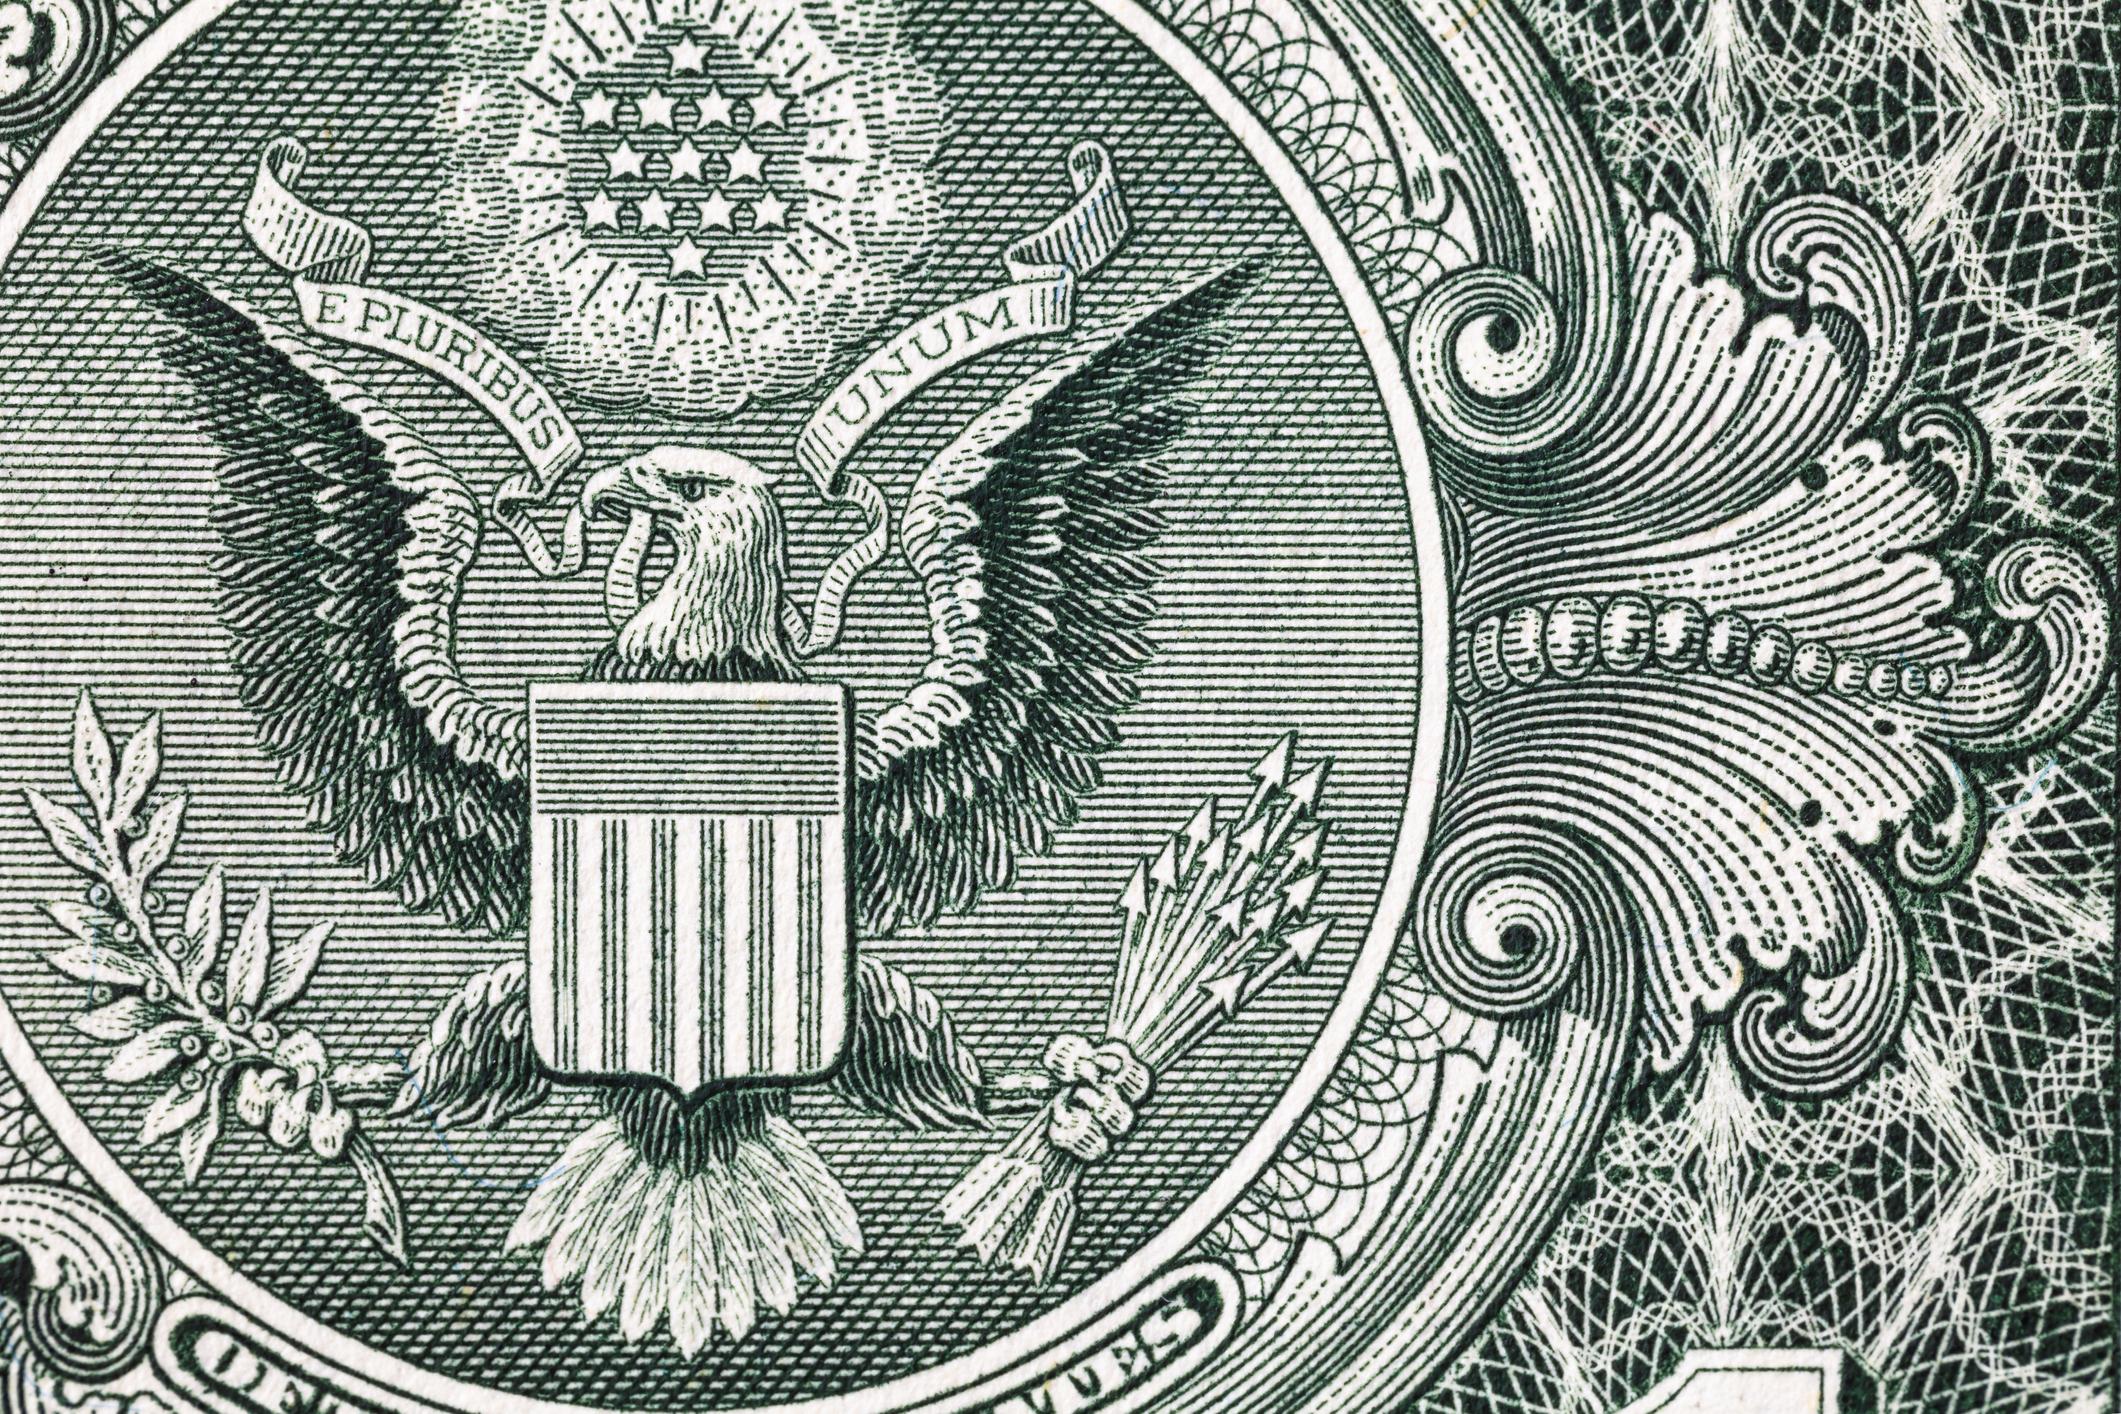 Closeup of back side of 1 dollar bill